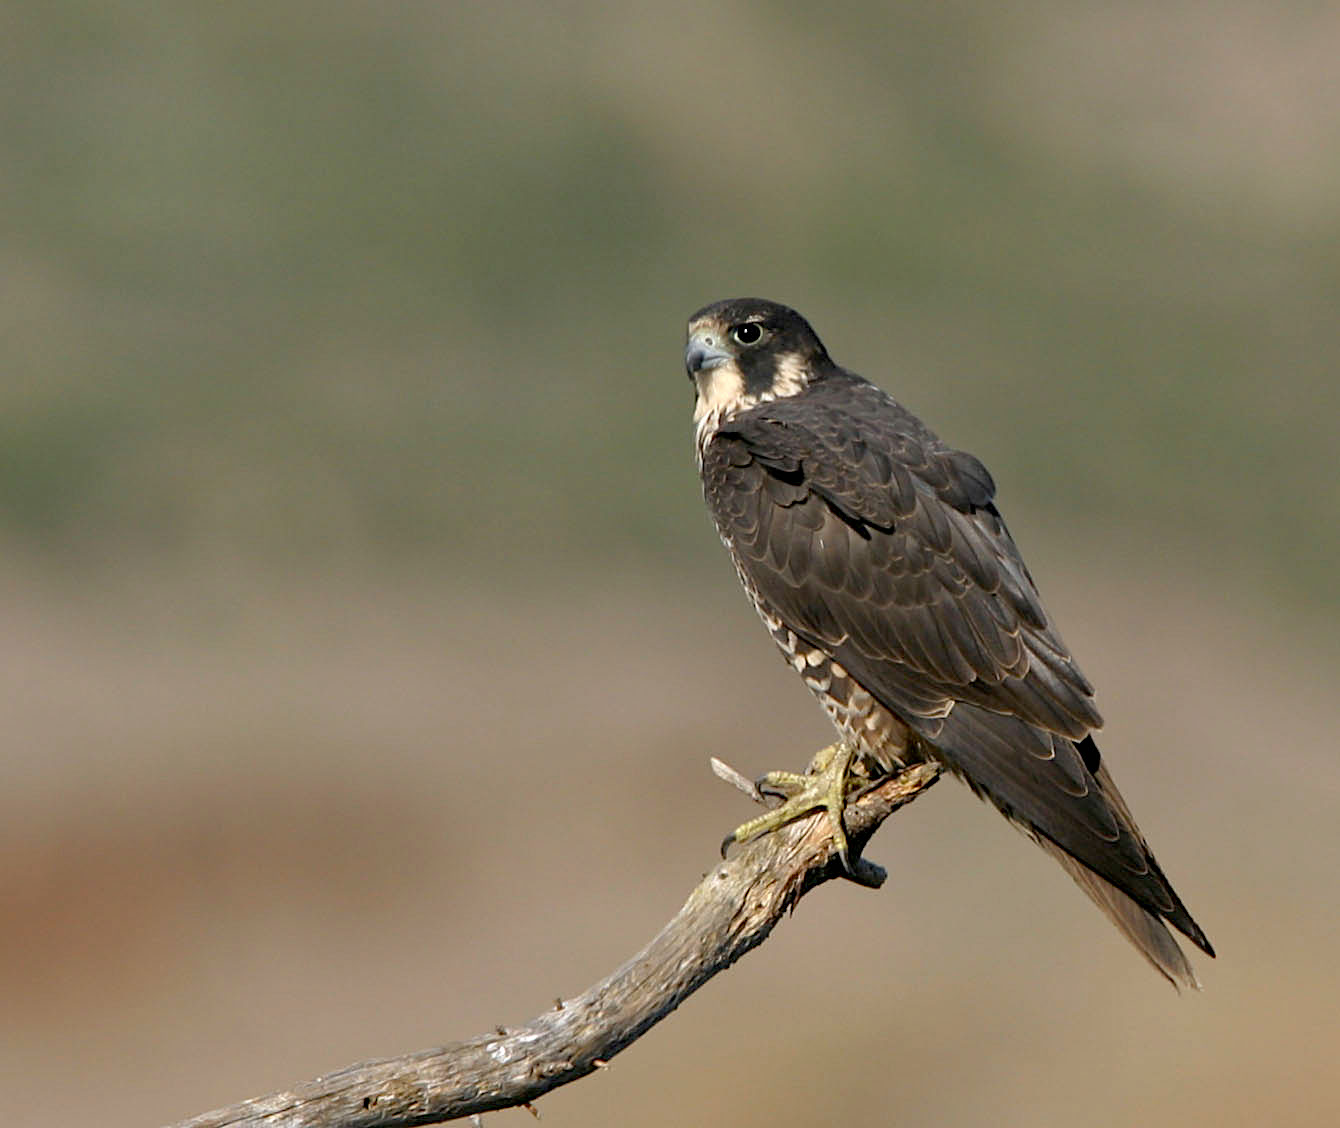 Peregrine Falcons Return to Eagle Rock